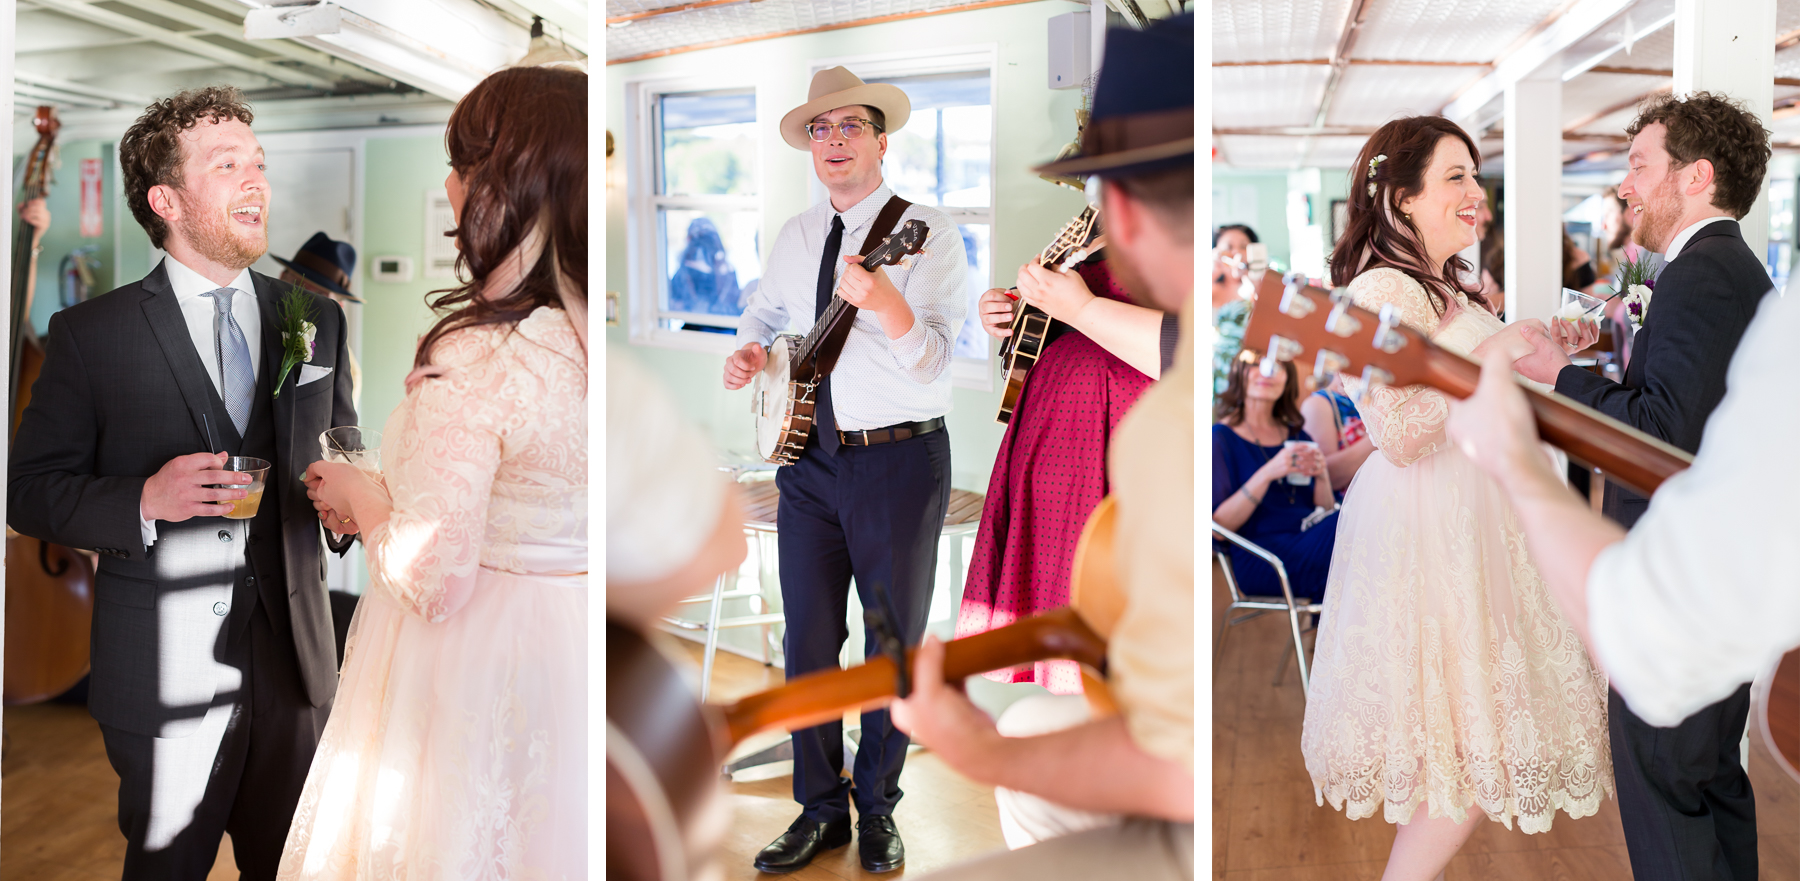 photojournalist-wedding-photographer-austin.jpg